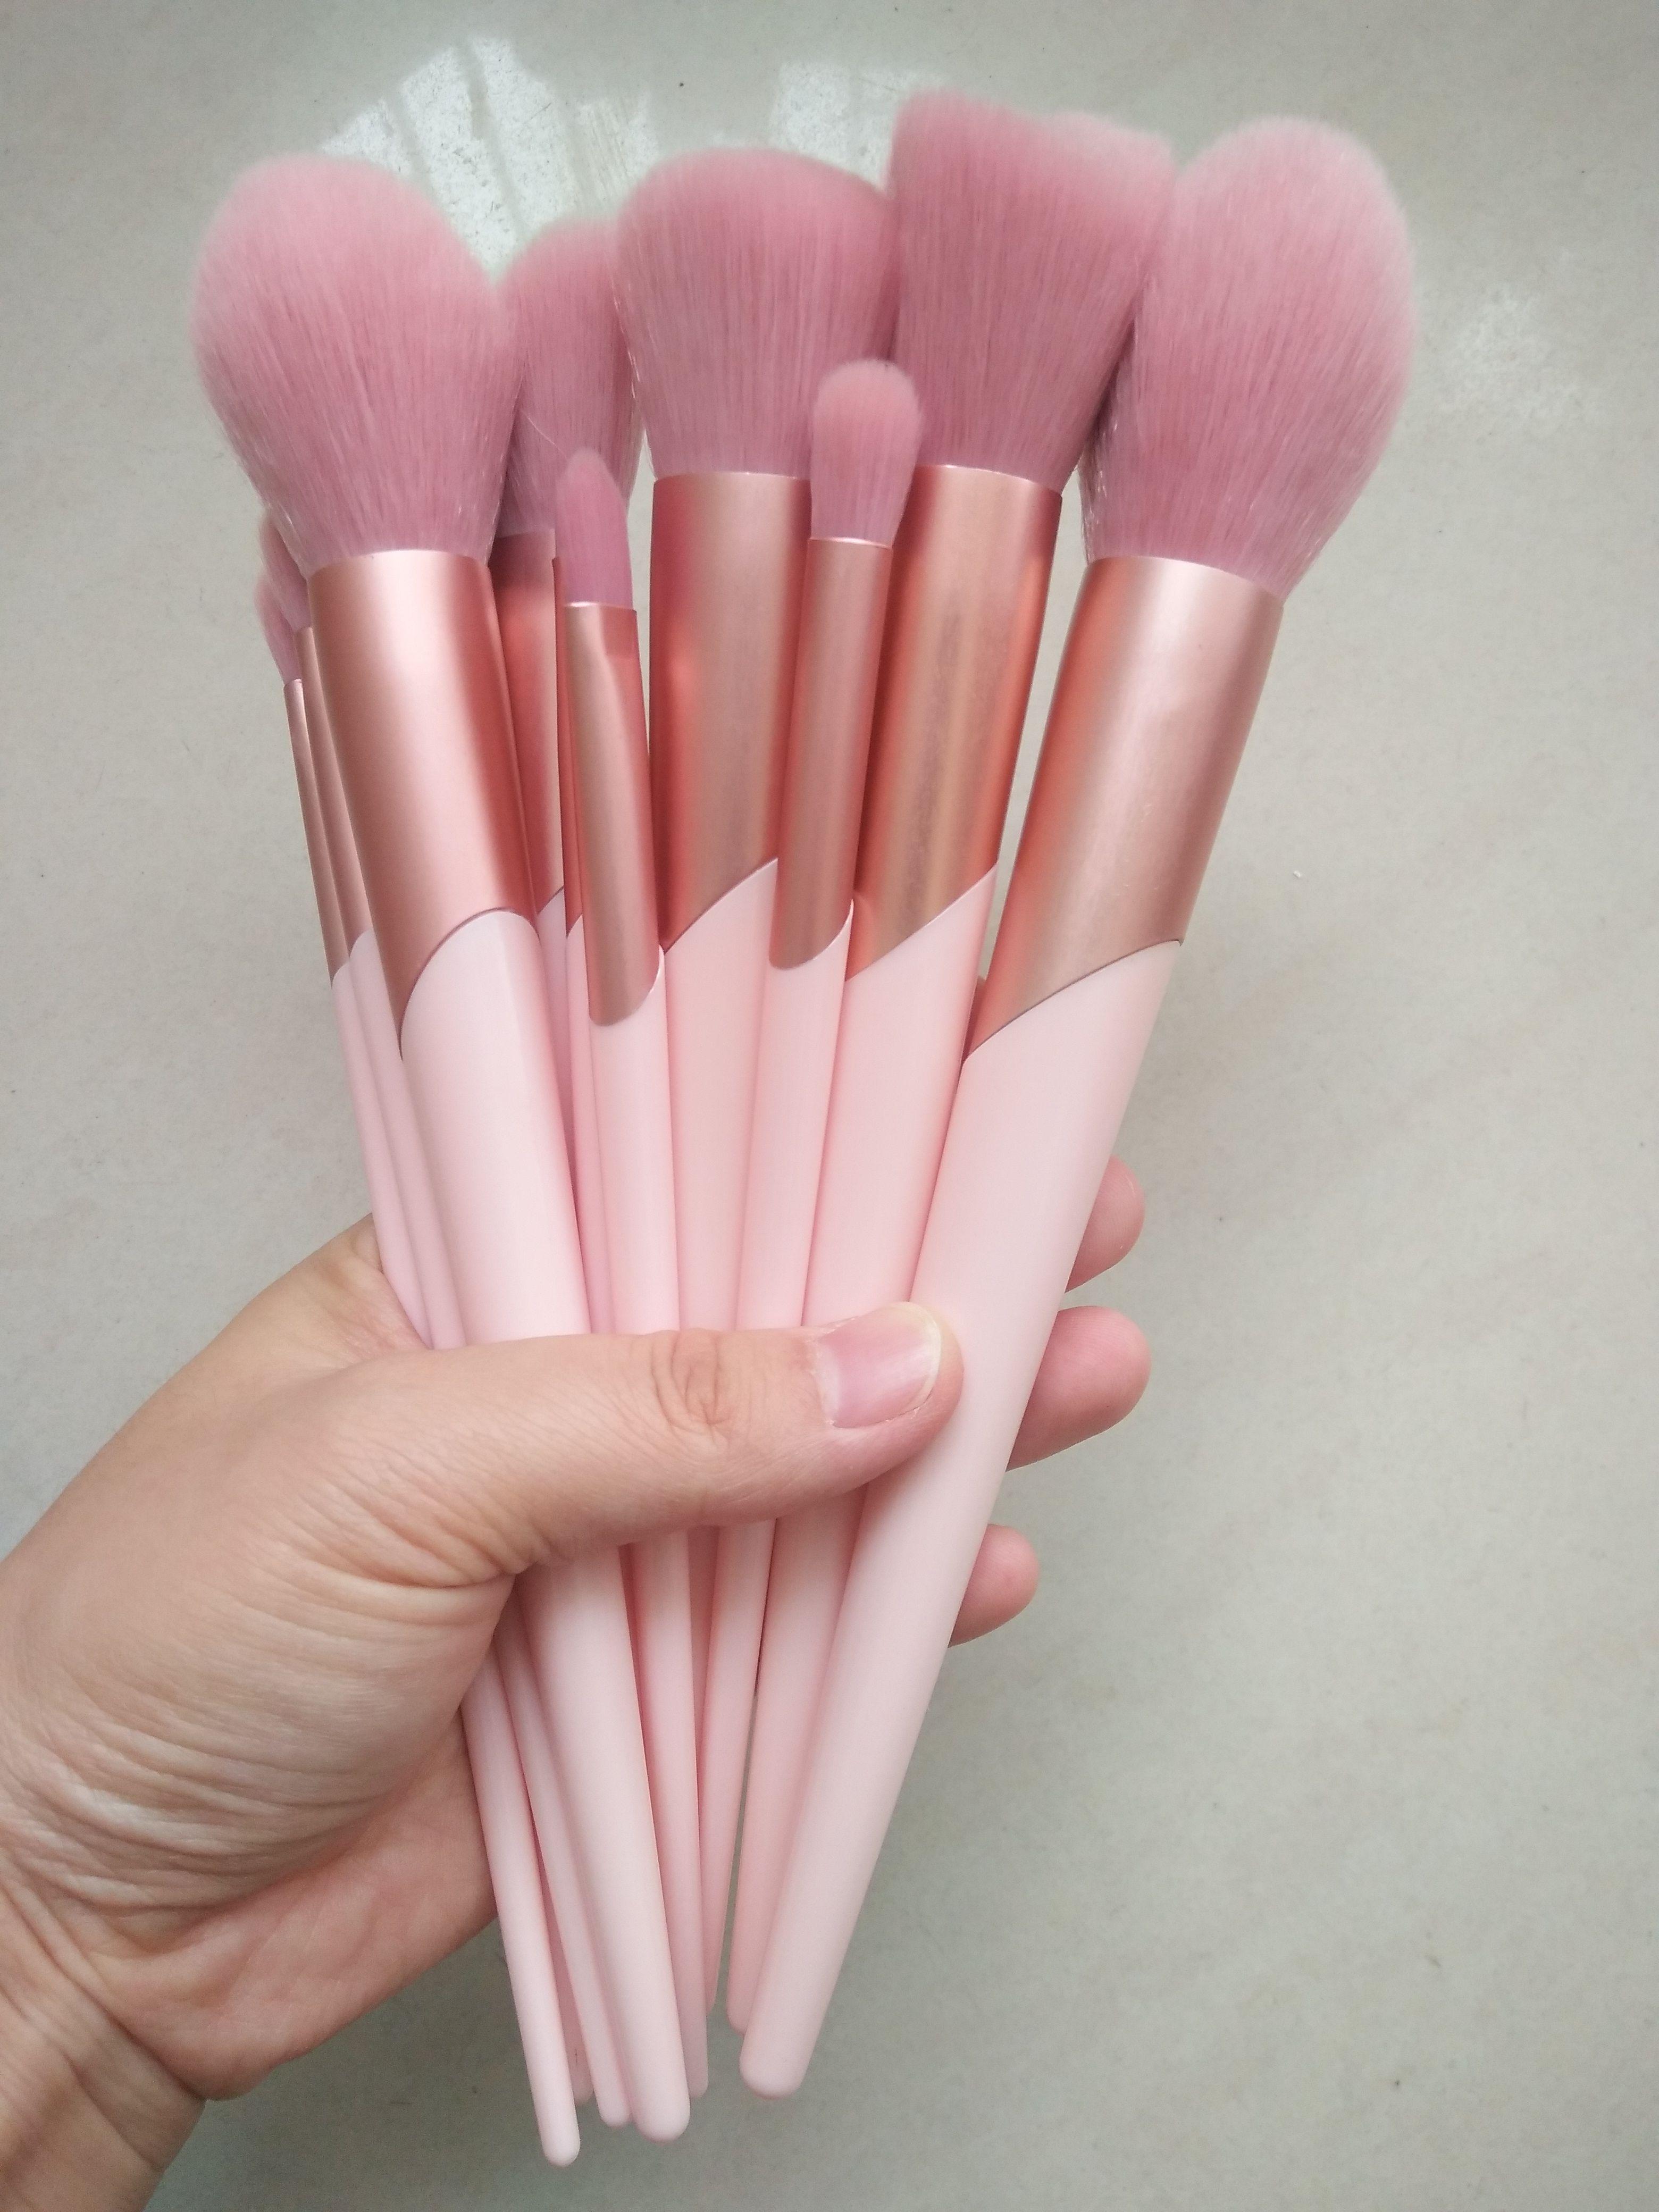 Cute Pink Makeup Brushes Set Available Wholesale Inquiry Muafan Aliyun Com Whatsapp Wechat 86 1342420 Pink Makeup Brush Pink Makeup Brushes Set Pink Makeup